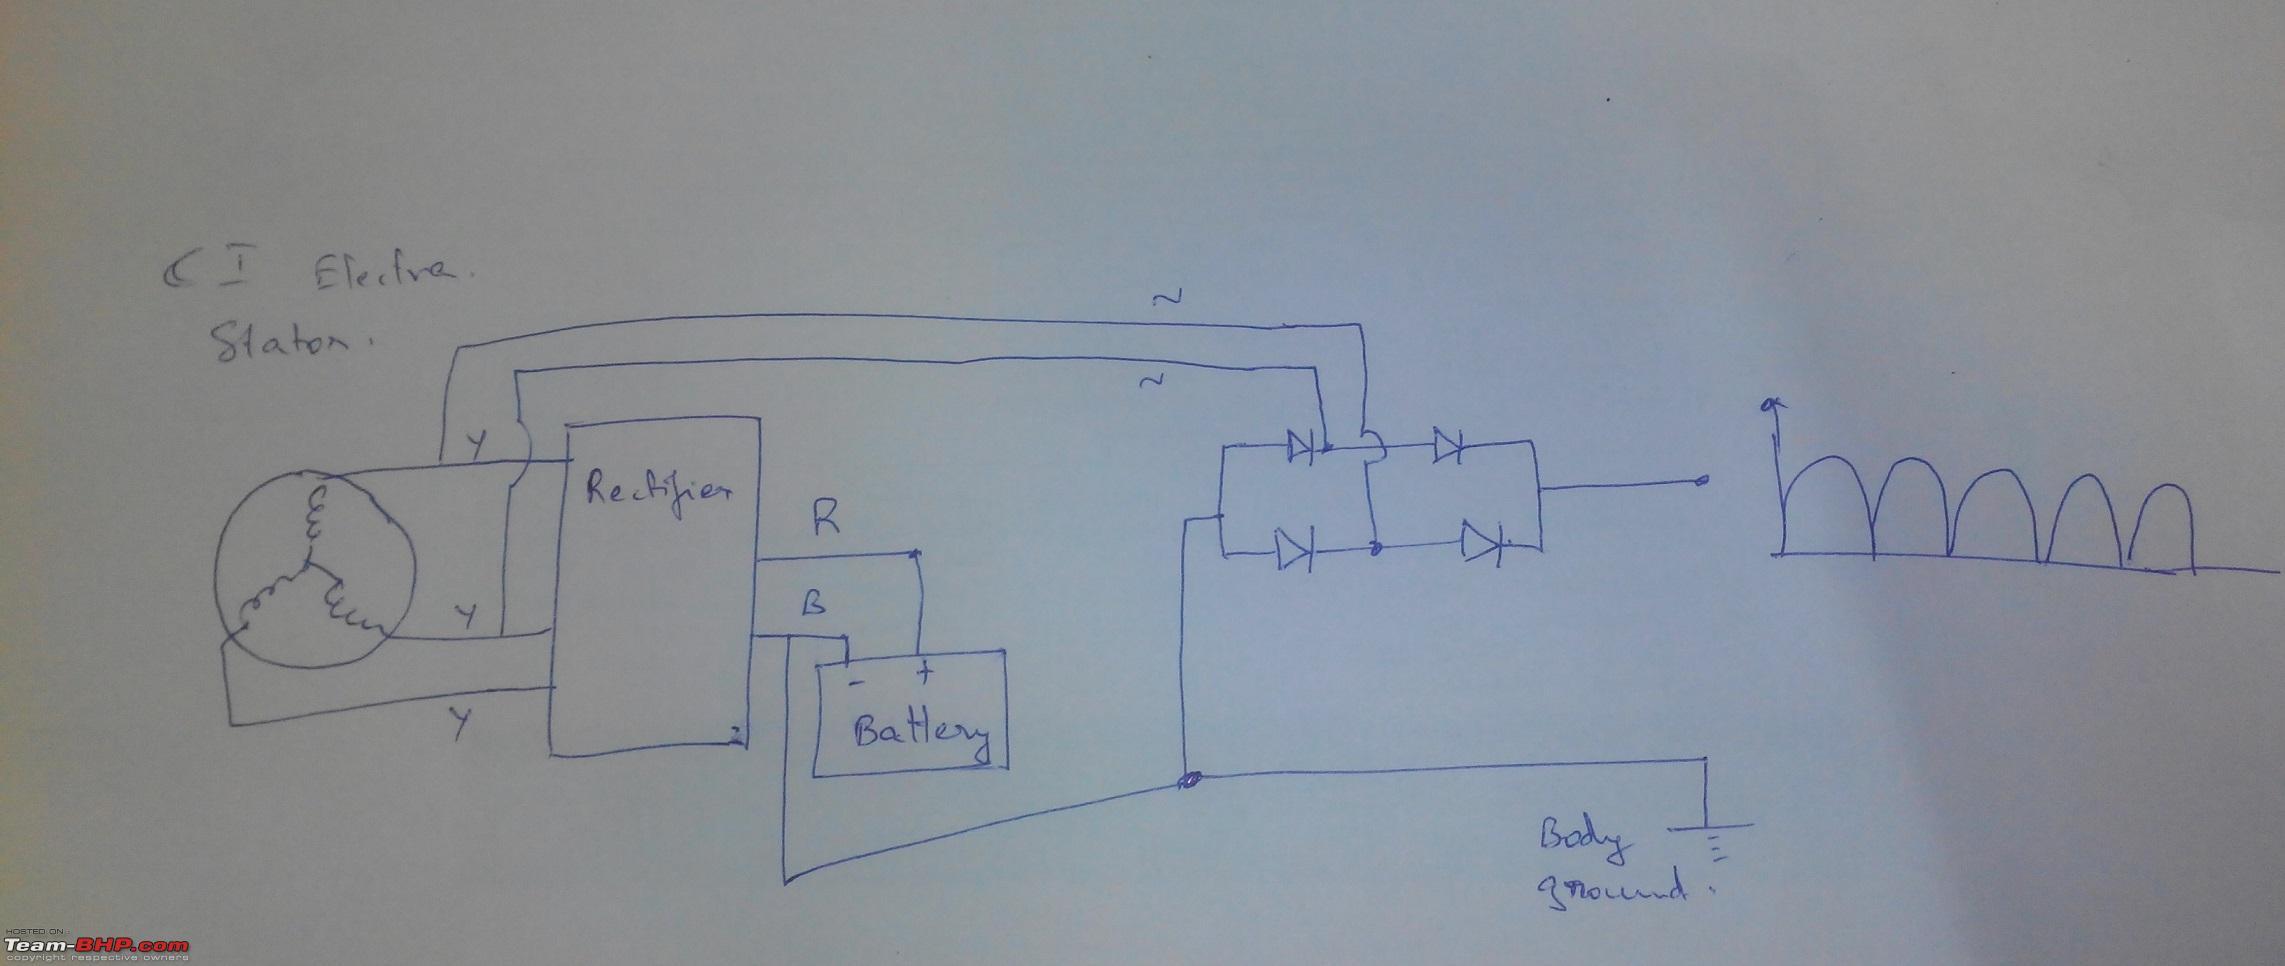 carburetor wiring diagram for electric brakes royal enfield 350 electra: restoration & upgrades - page 2 team-bhp